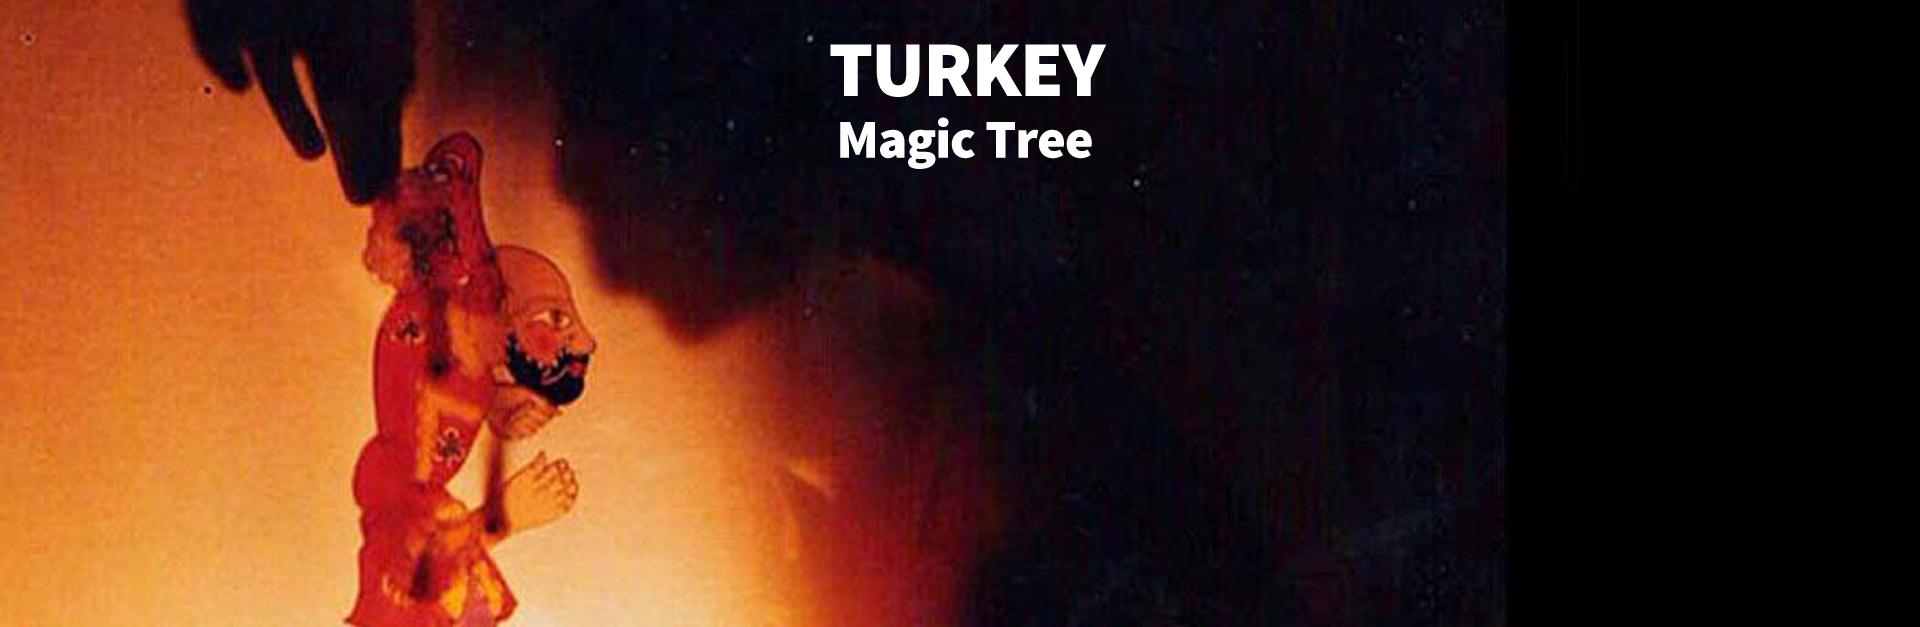 magictree